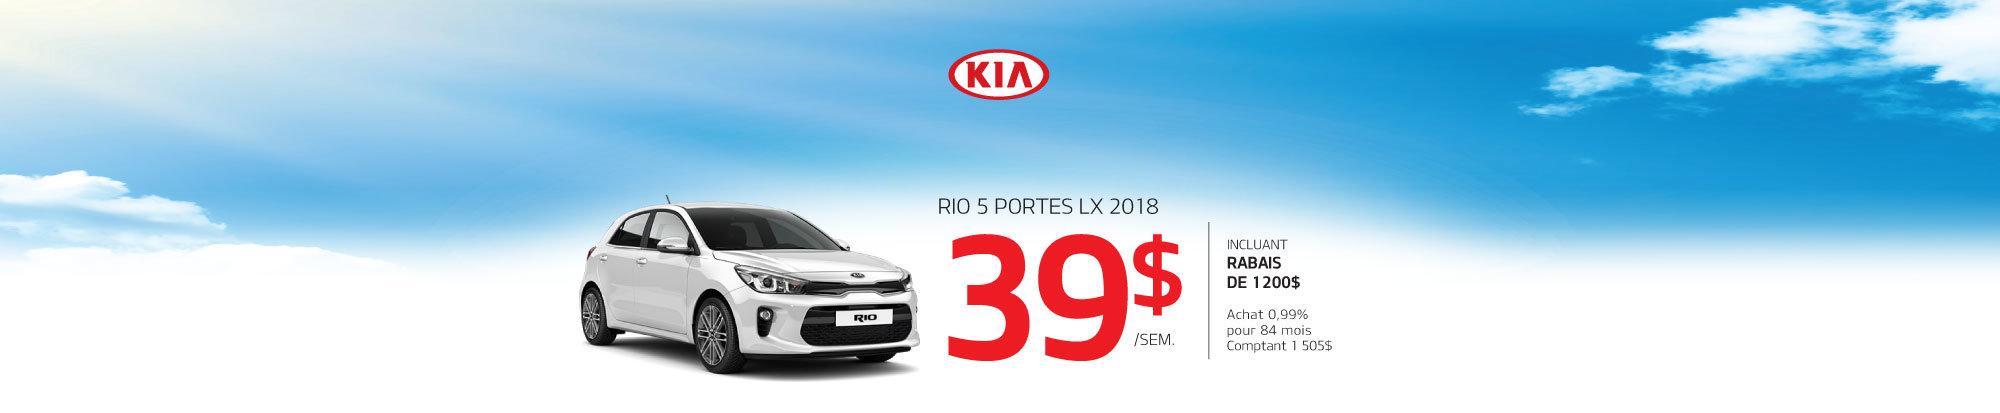 Rio5 portes 2018 à prix incroyable! web